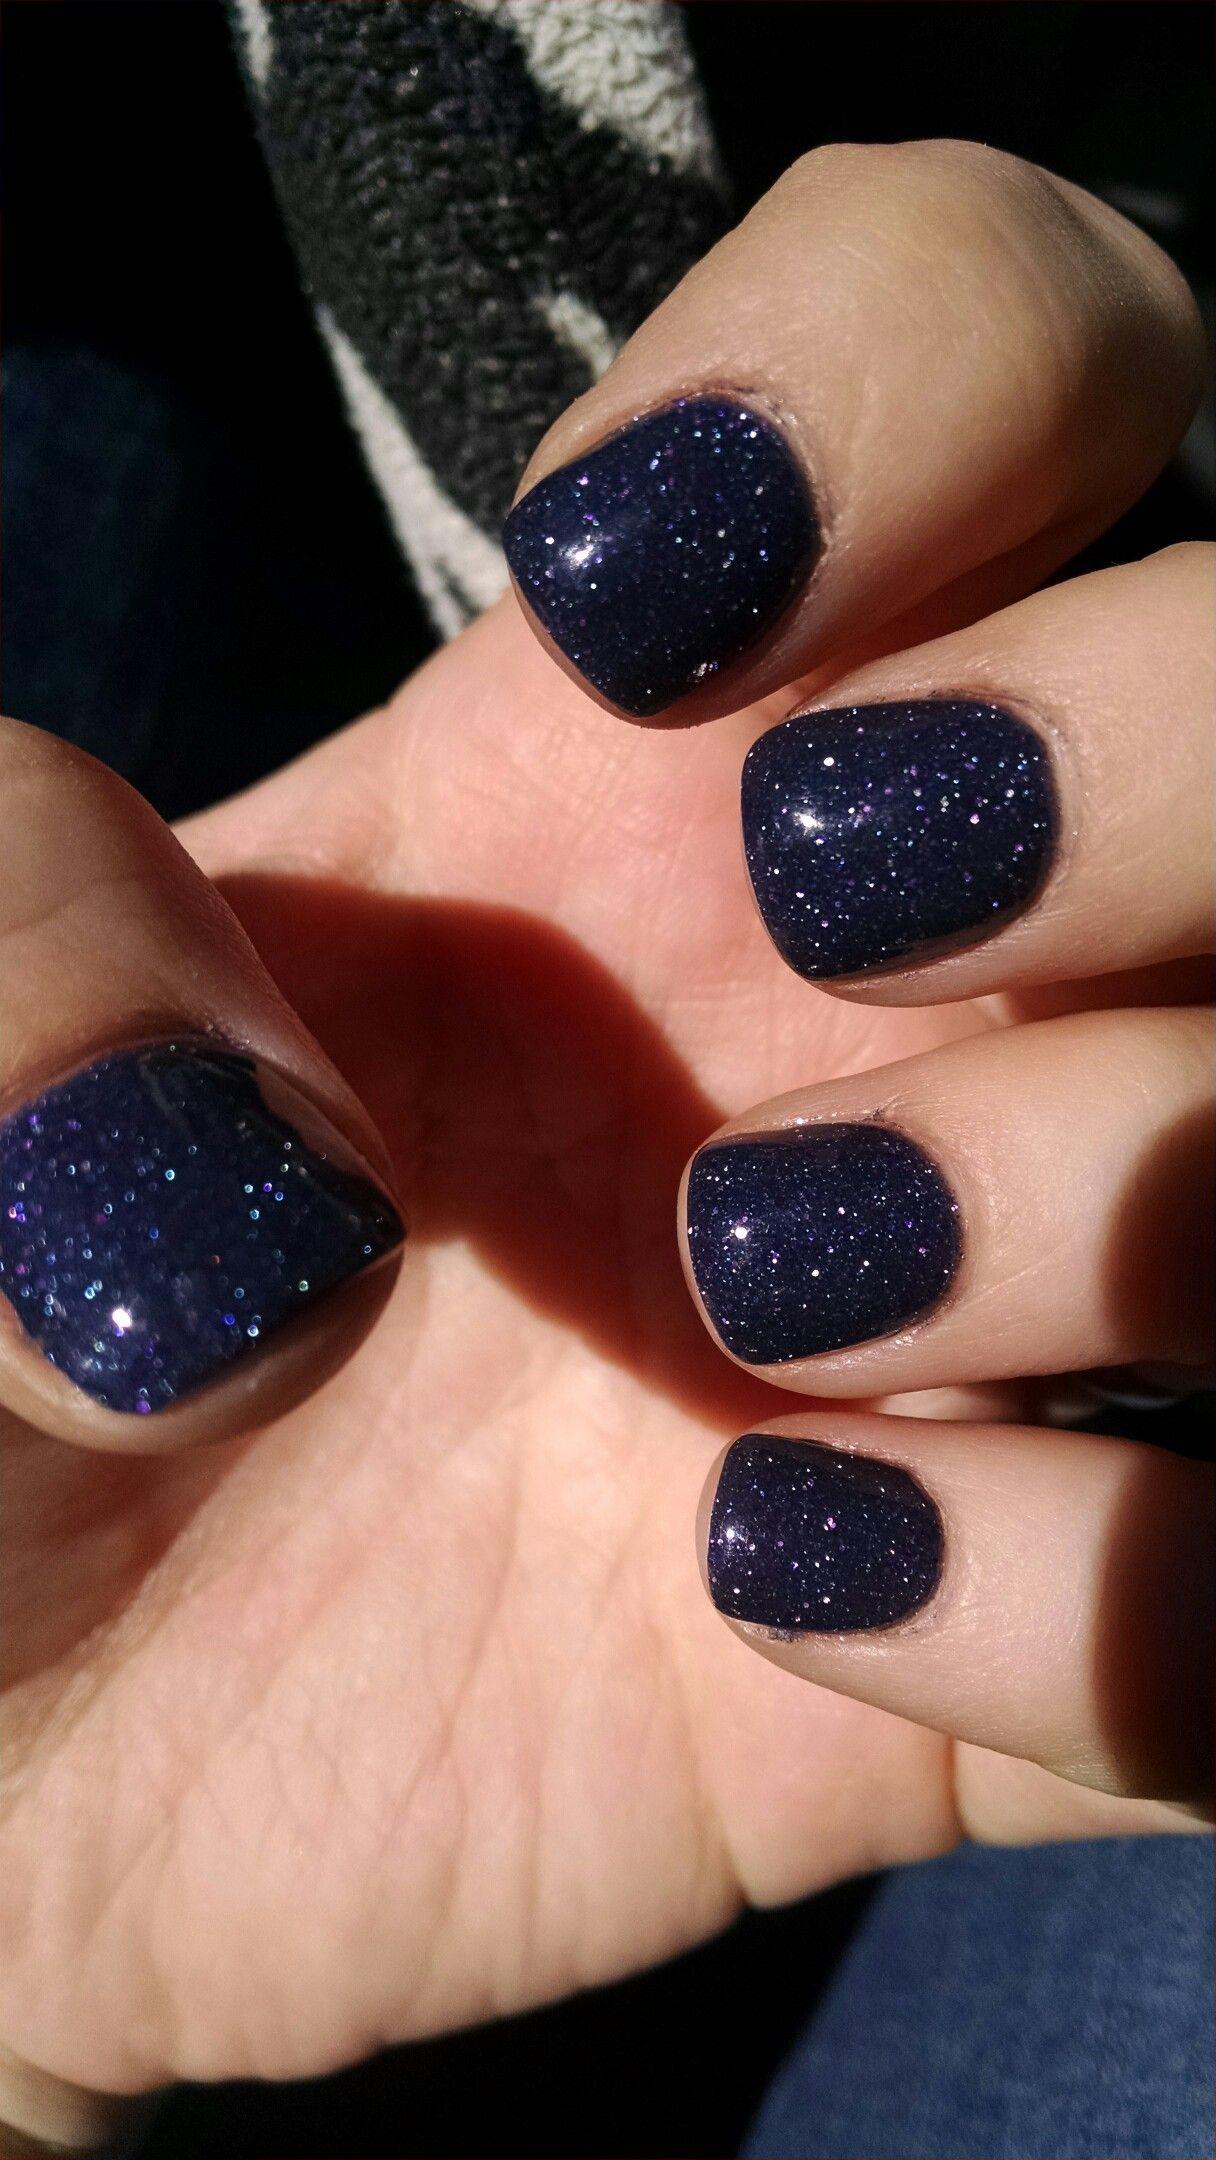 Sparkly blue/purple NexGen nails | Fashion: Nail Art - Rhonda ...